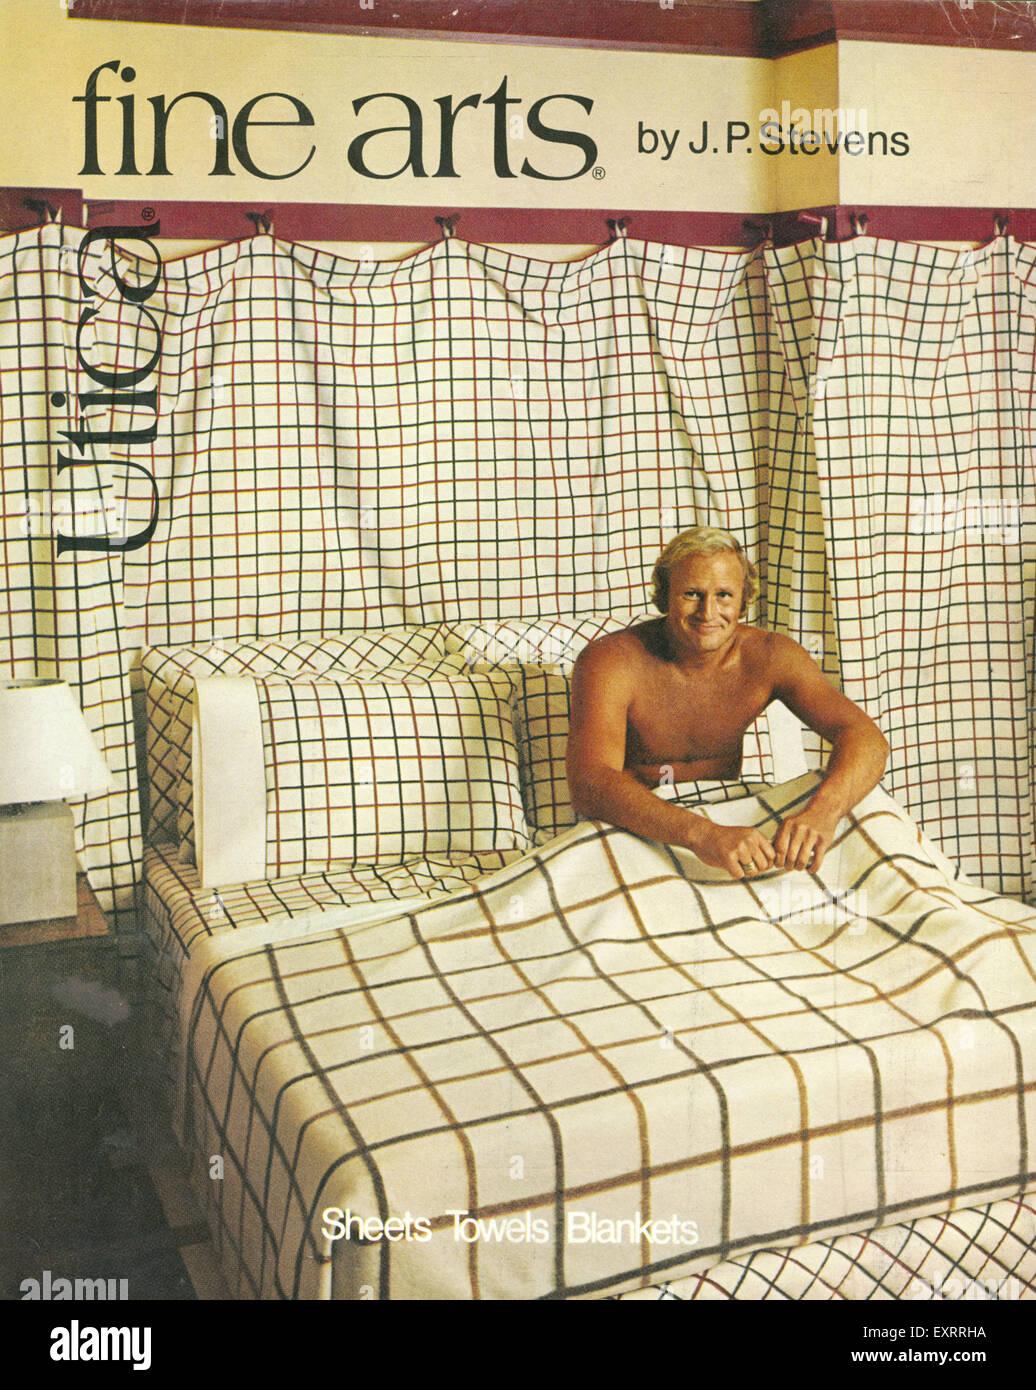 1970S UK Belle Arti Utica Magazine annuncio pubblicitario Immagini Stock